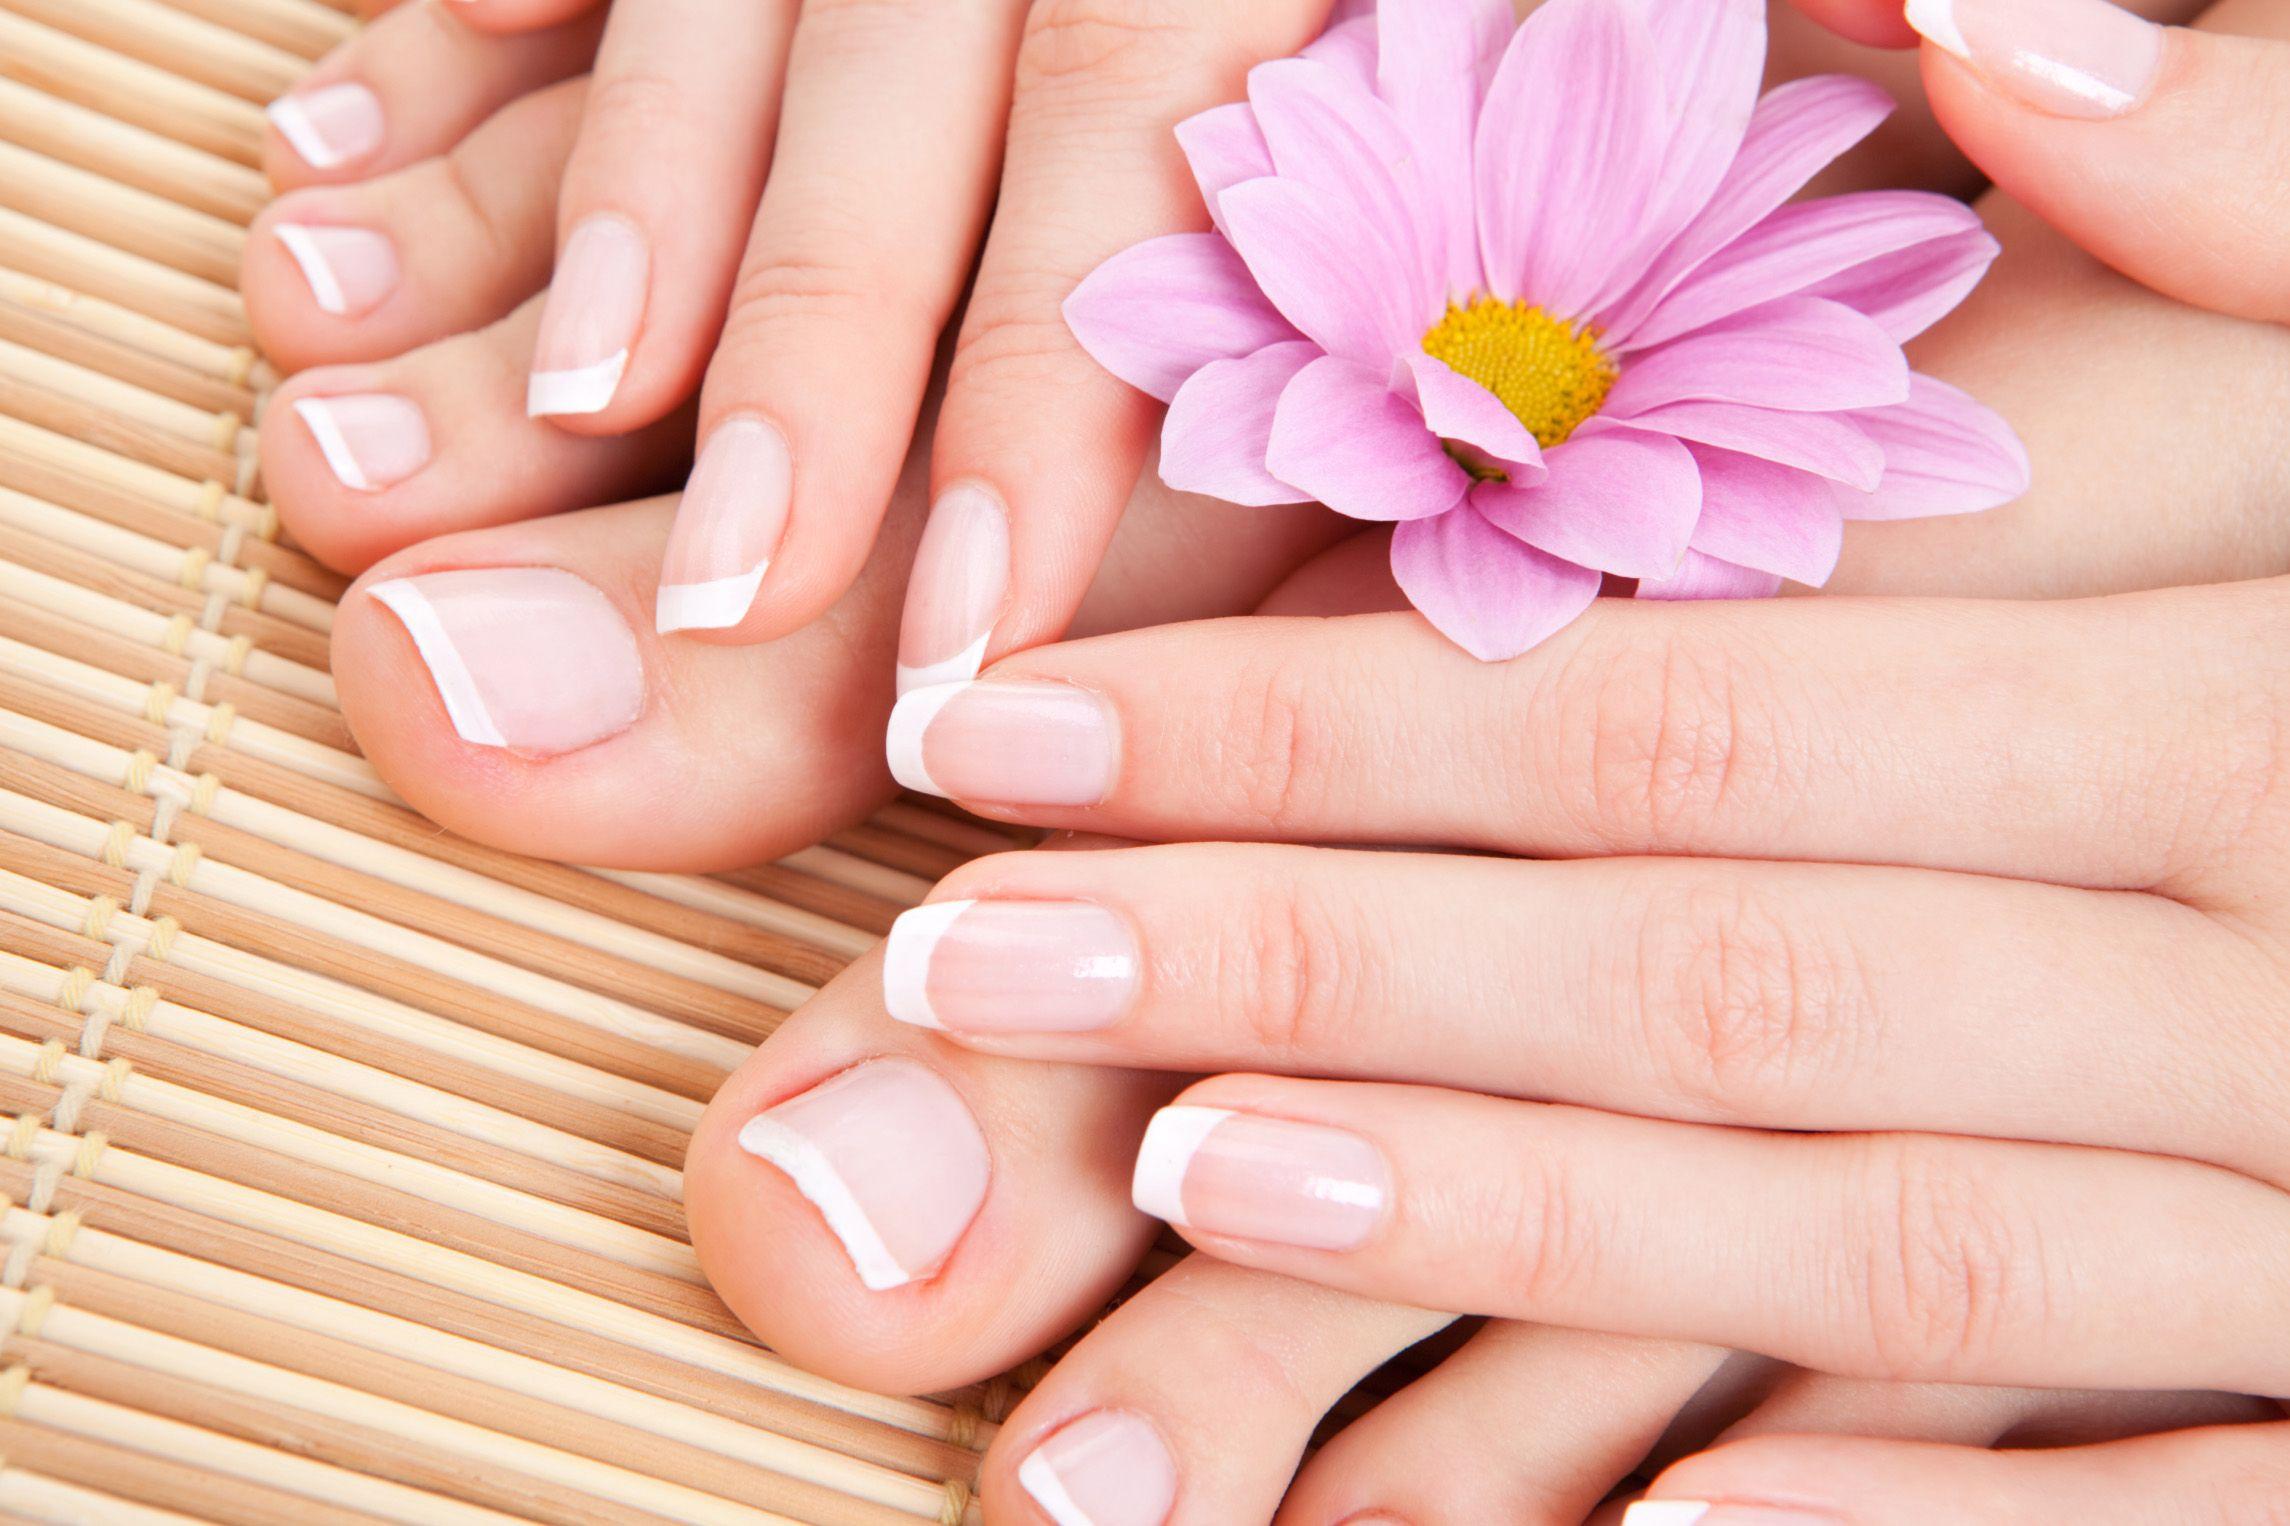 manicure and pedicure exam questions splendid wedding company rh splendidweddingcompany com Acrylic Nails Acrylic Nails